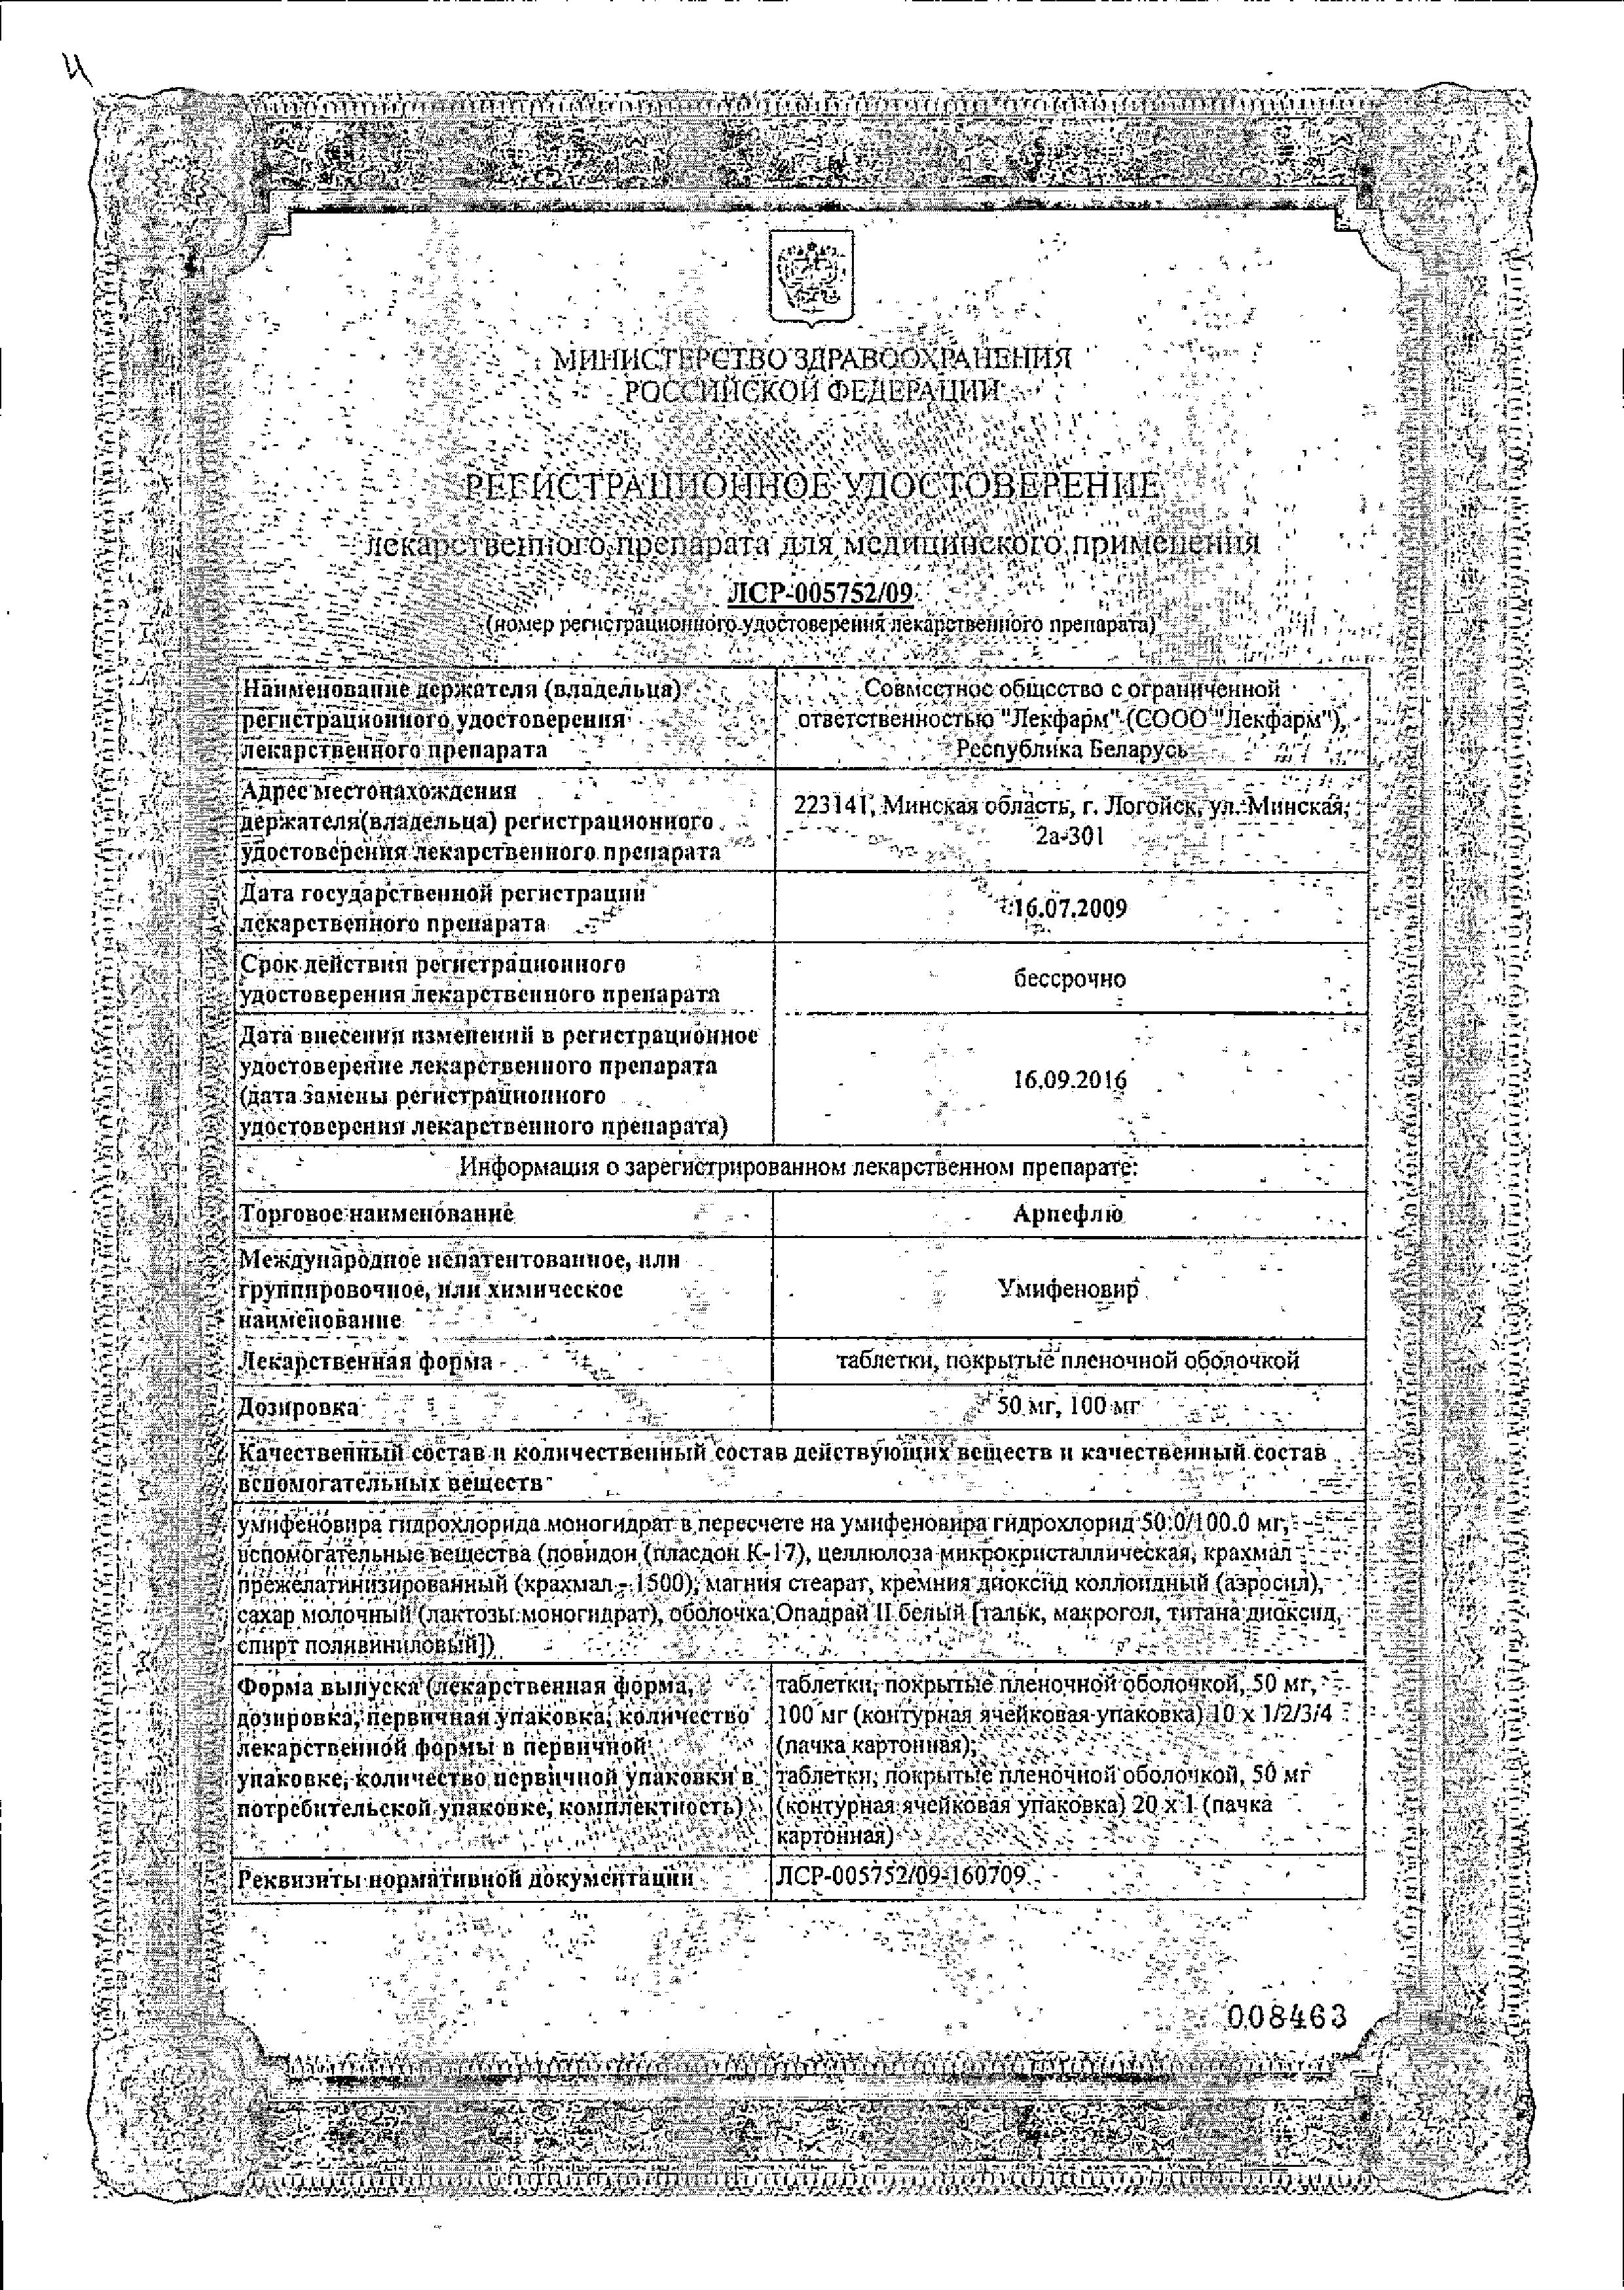 Арпефлю сертификат